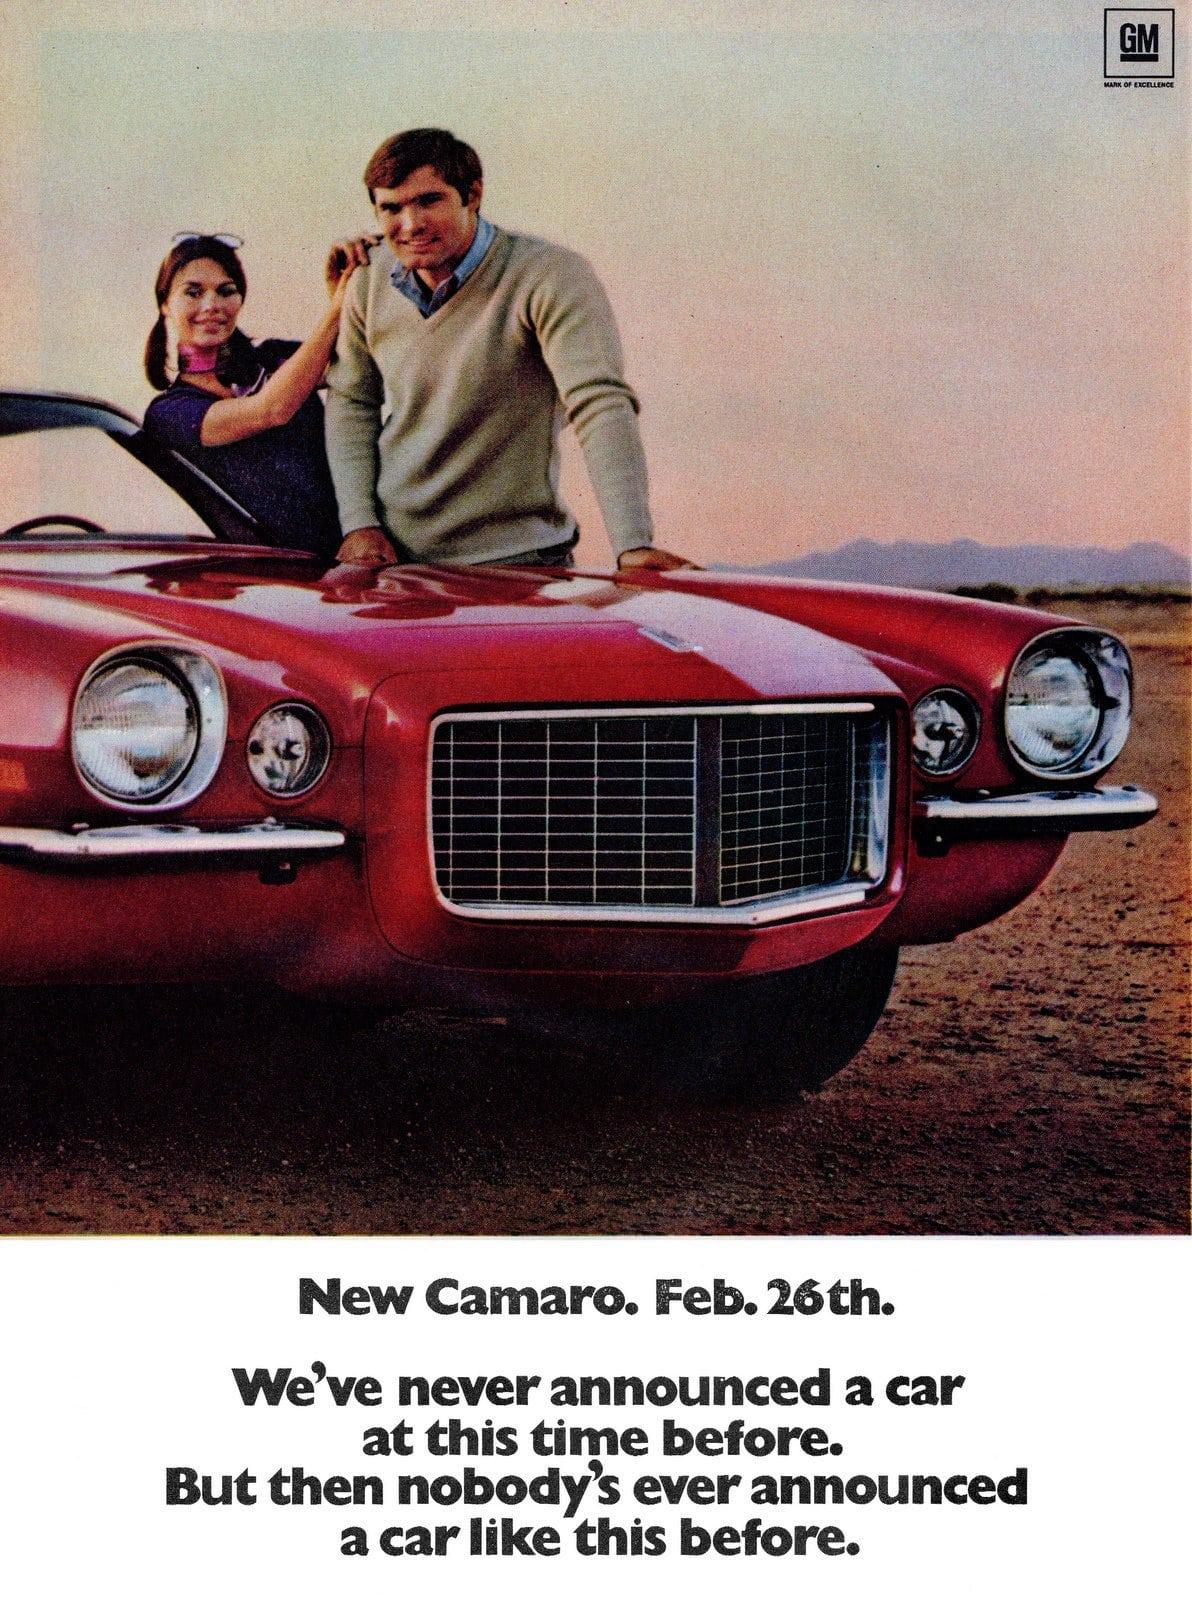 1970 Camaro Super Hugger - Classic Chevy cars (2)